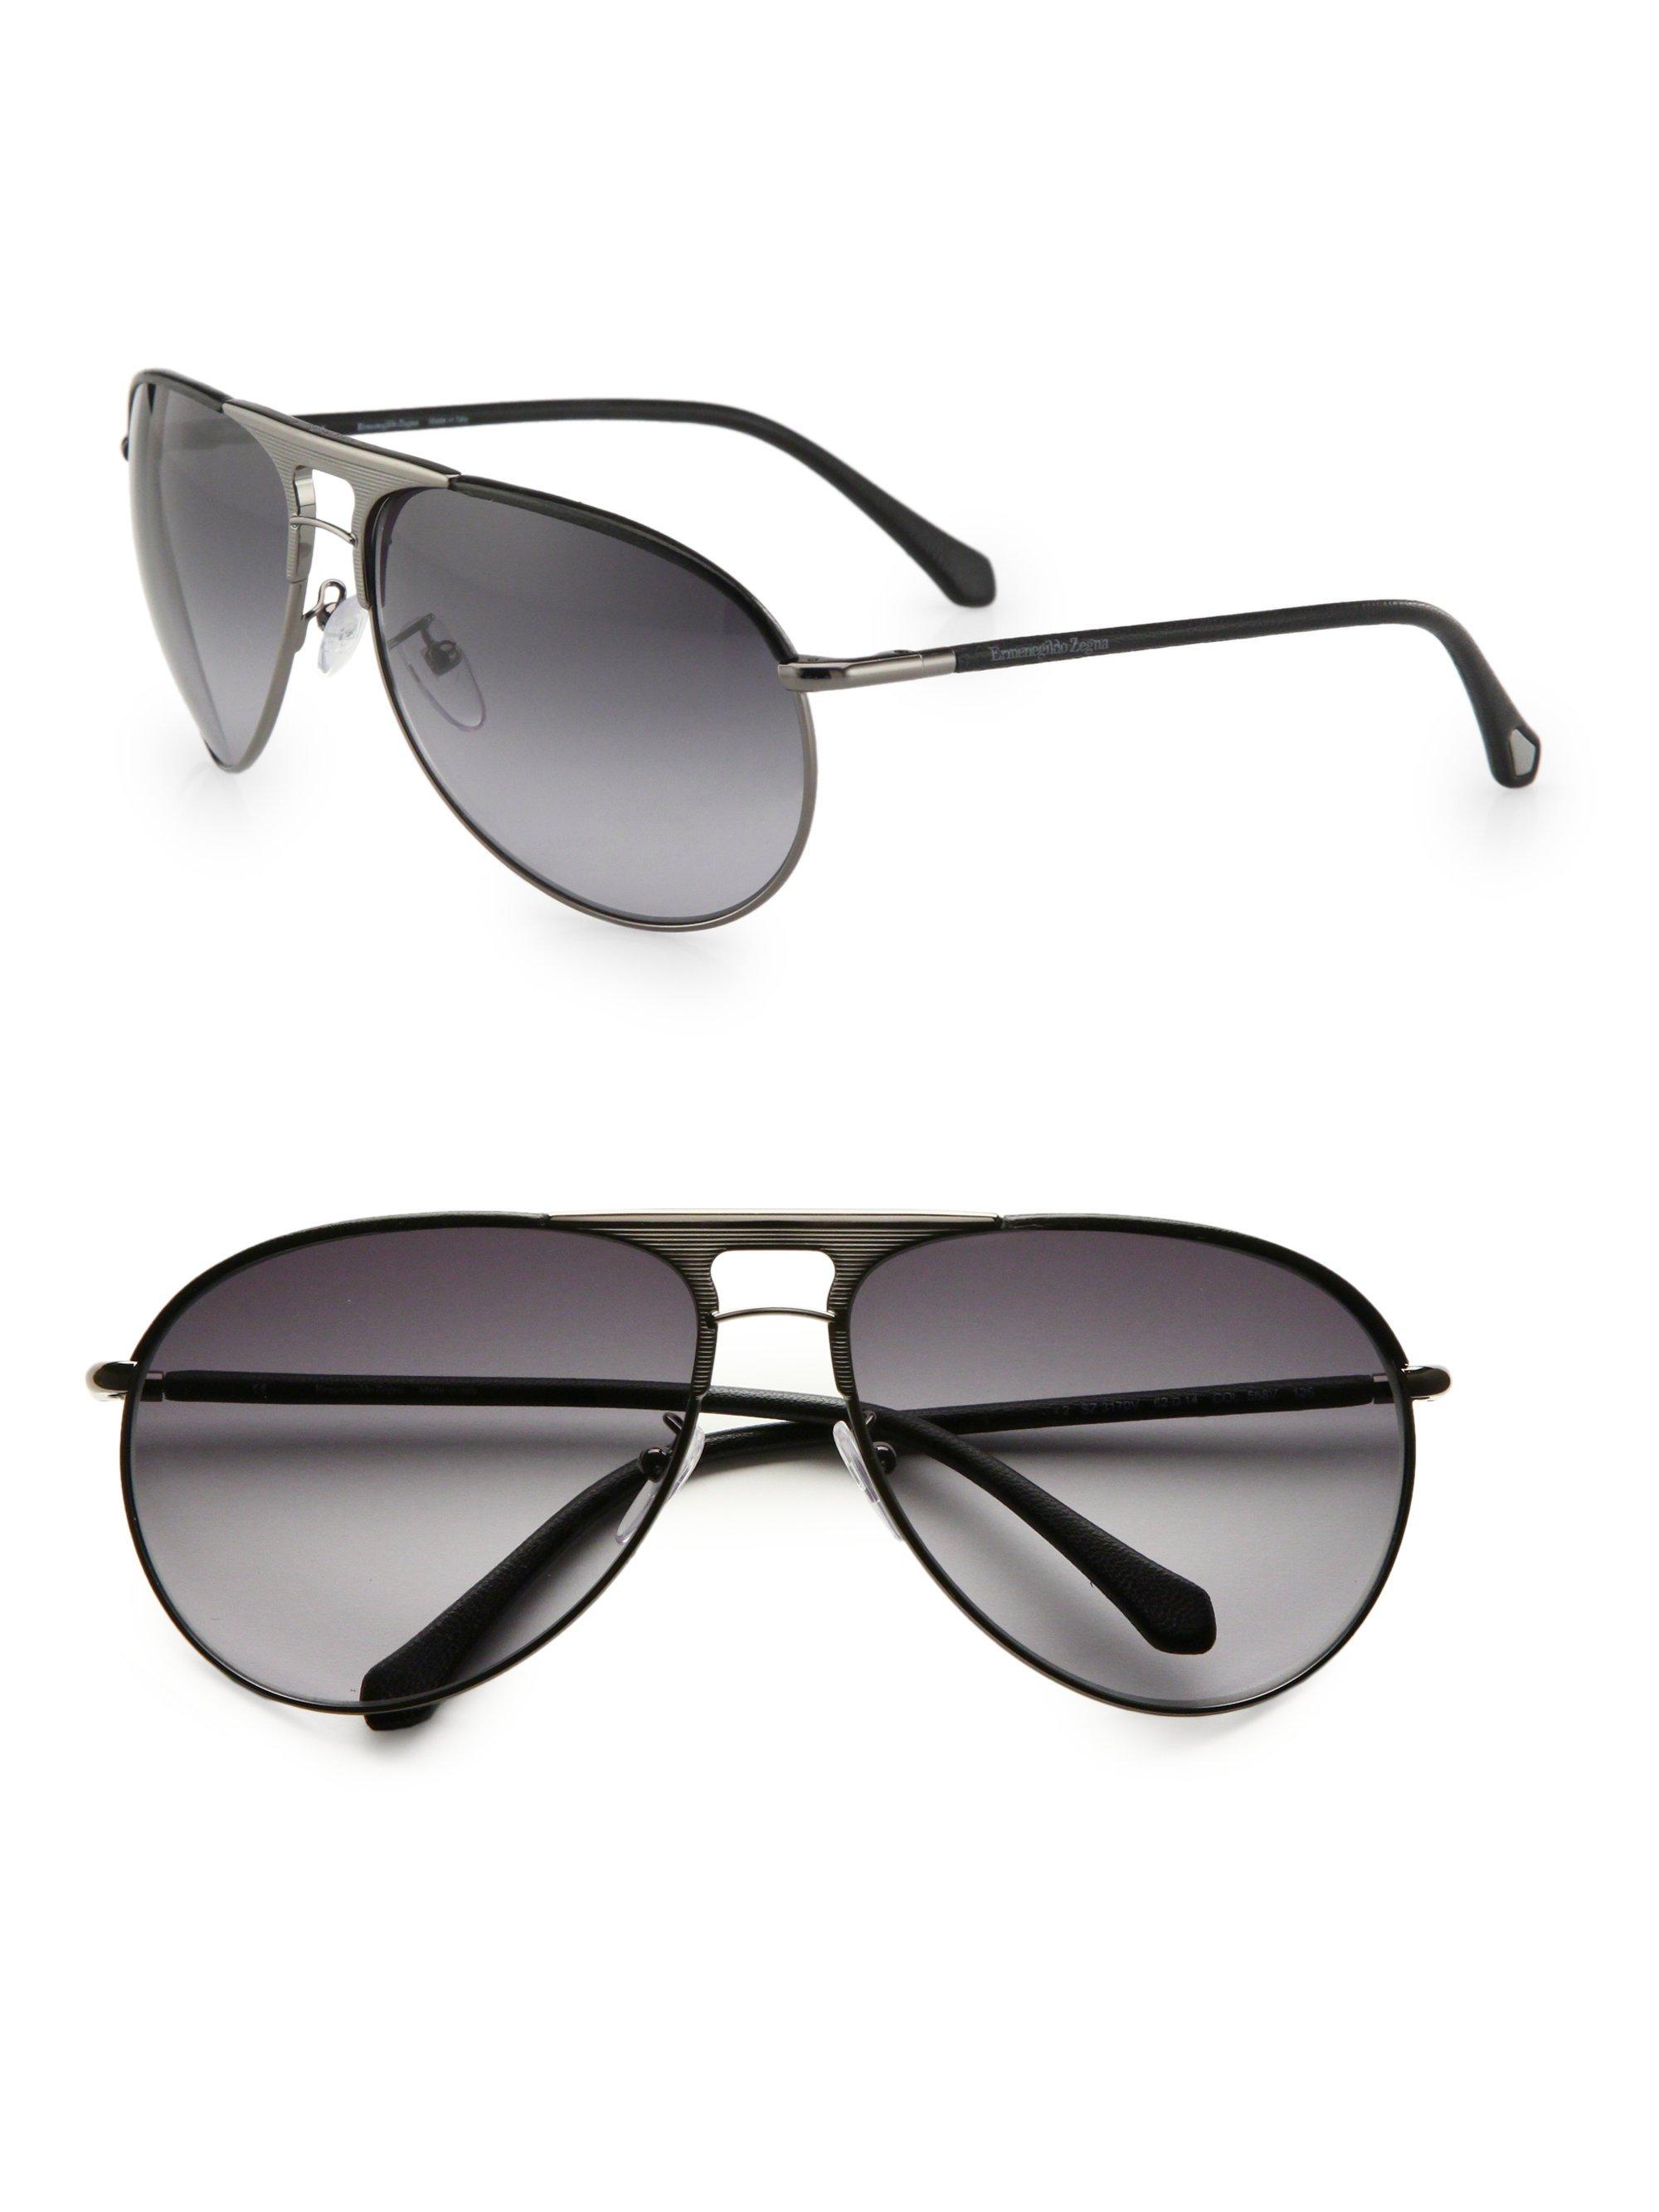 mens black aviator sunglasses upzm  Gallery